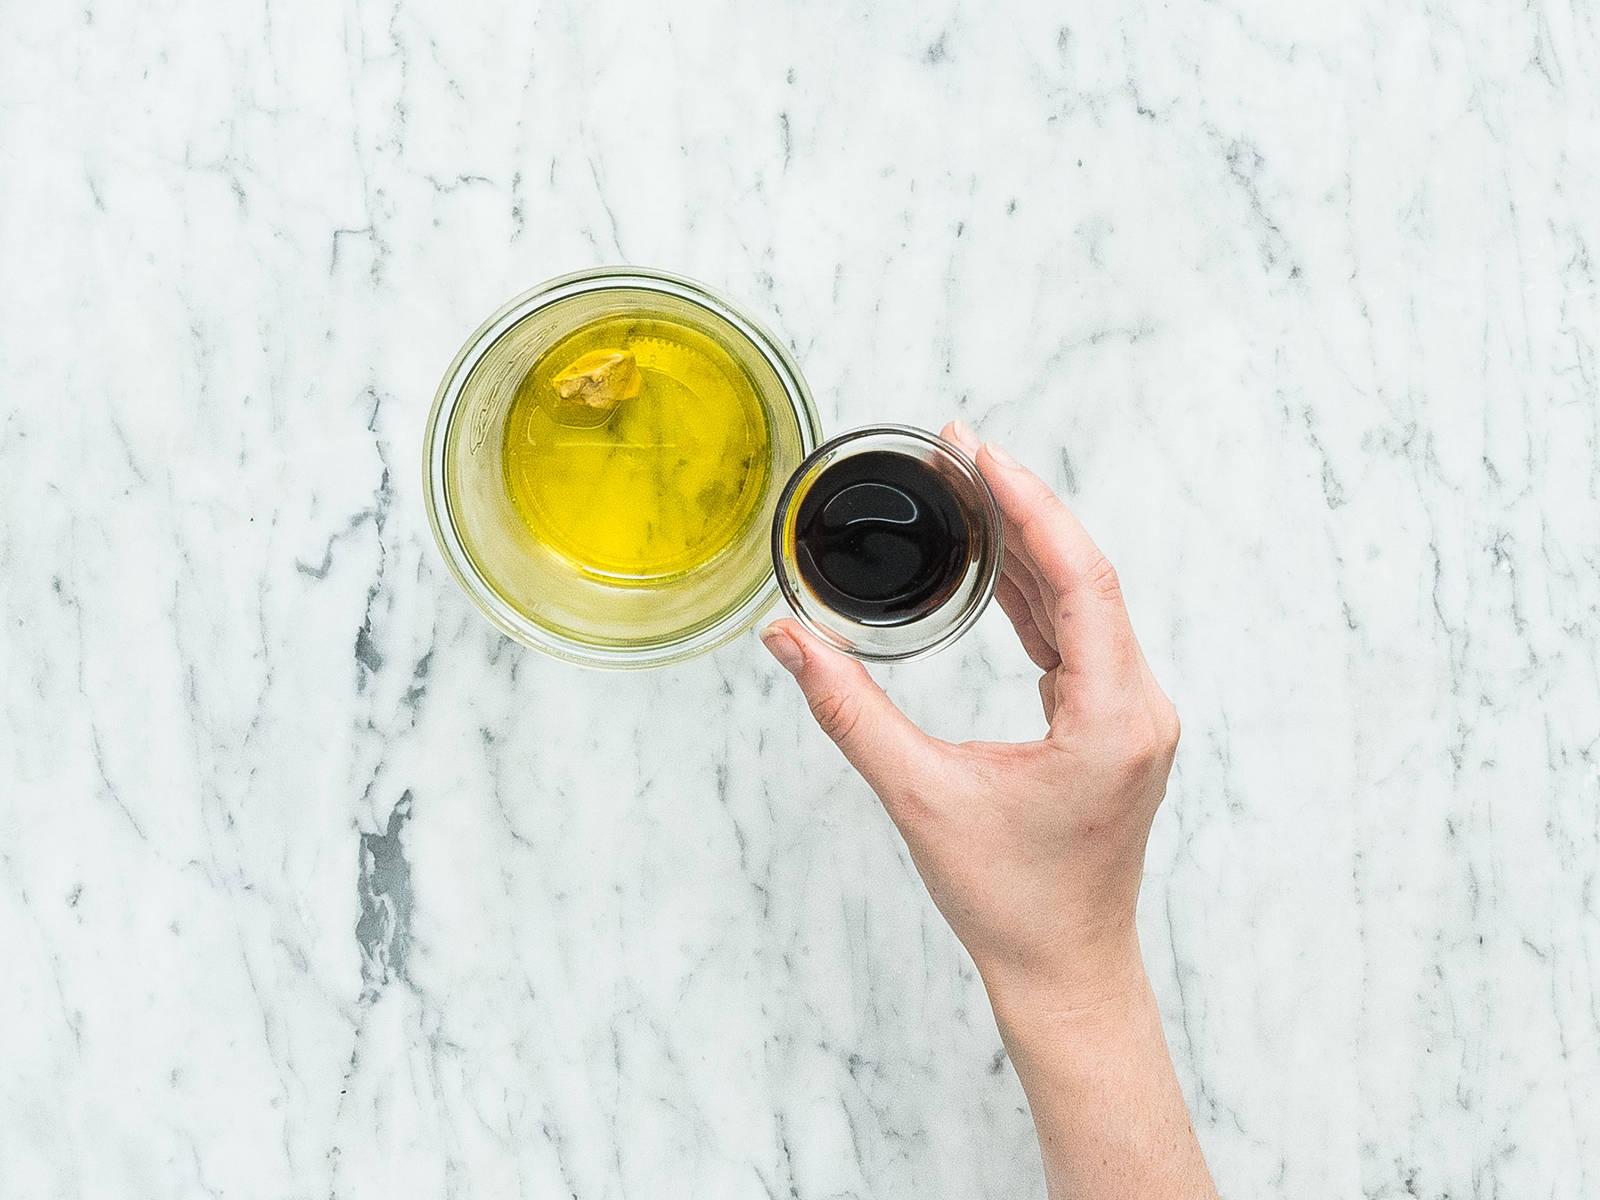 For the vinaigrette, mix the white wine vinegar, balsamic vinegar, mustard, and olive oil in an airtight jar. Season to taste with salt and pepper.